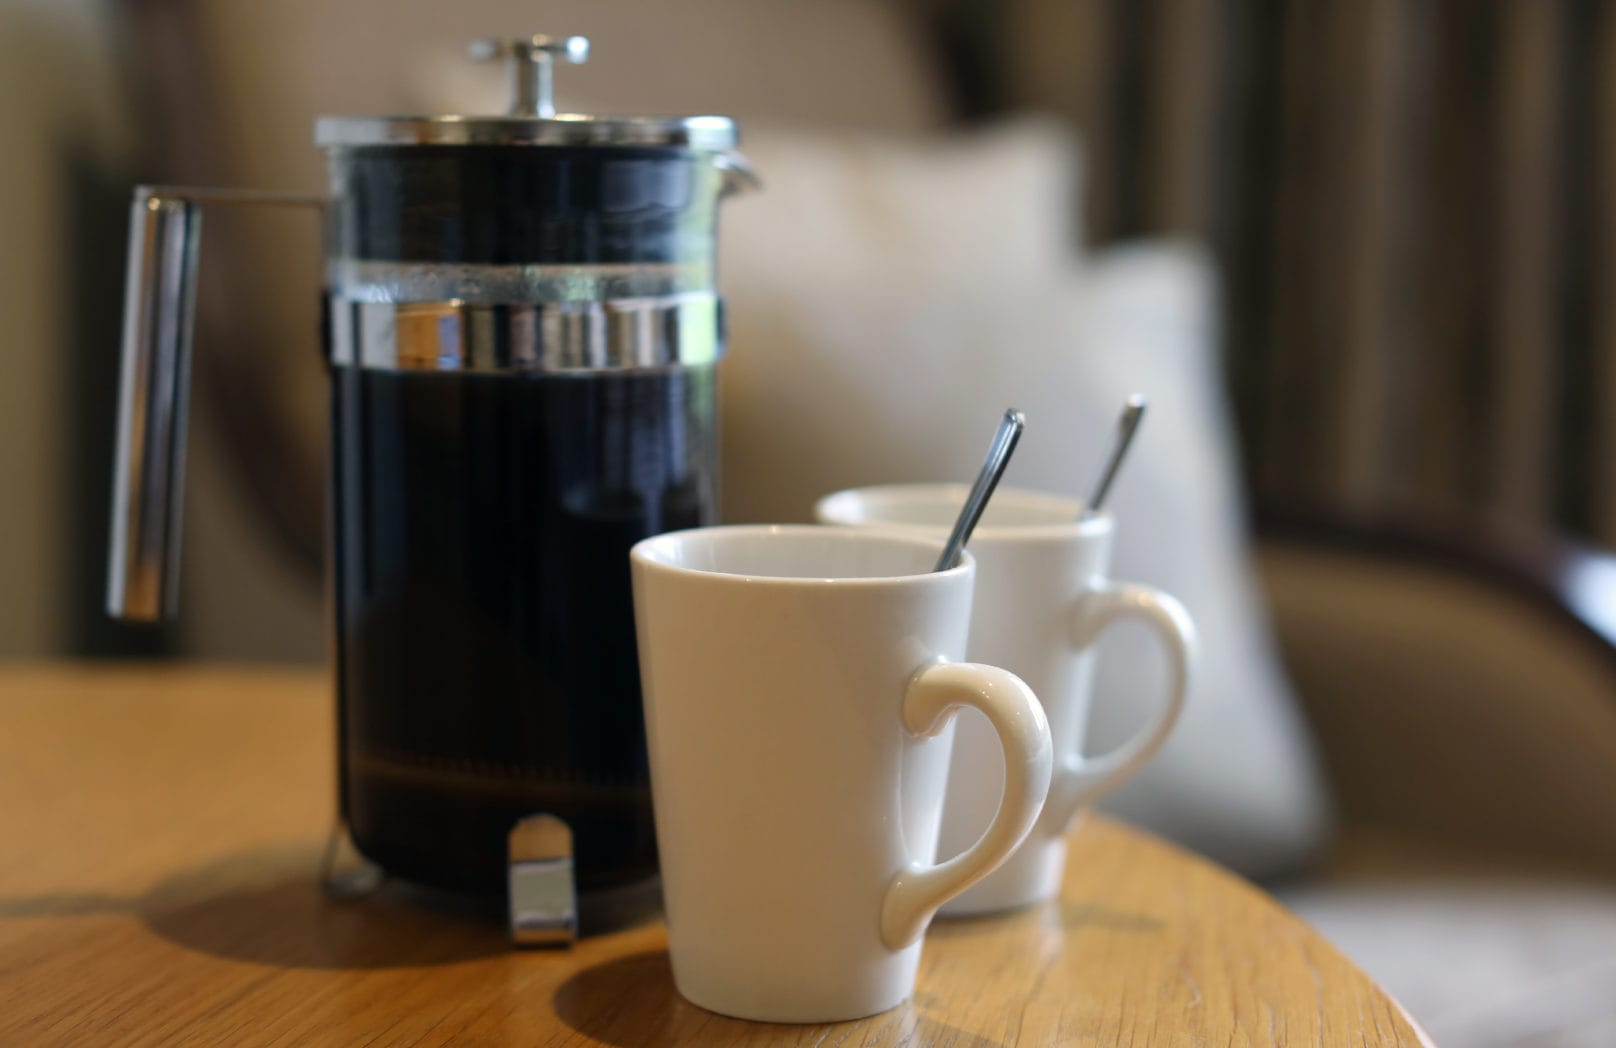 Coffee and mugs hotel bedroom